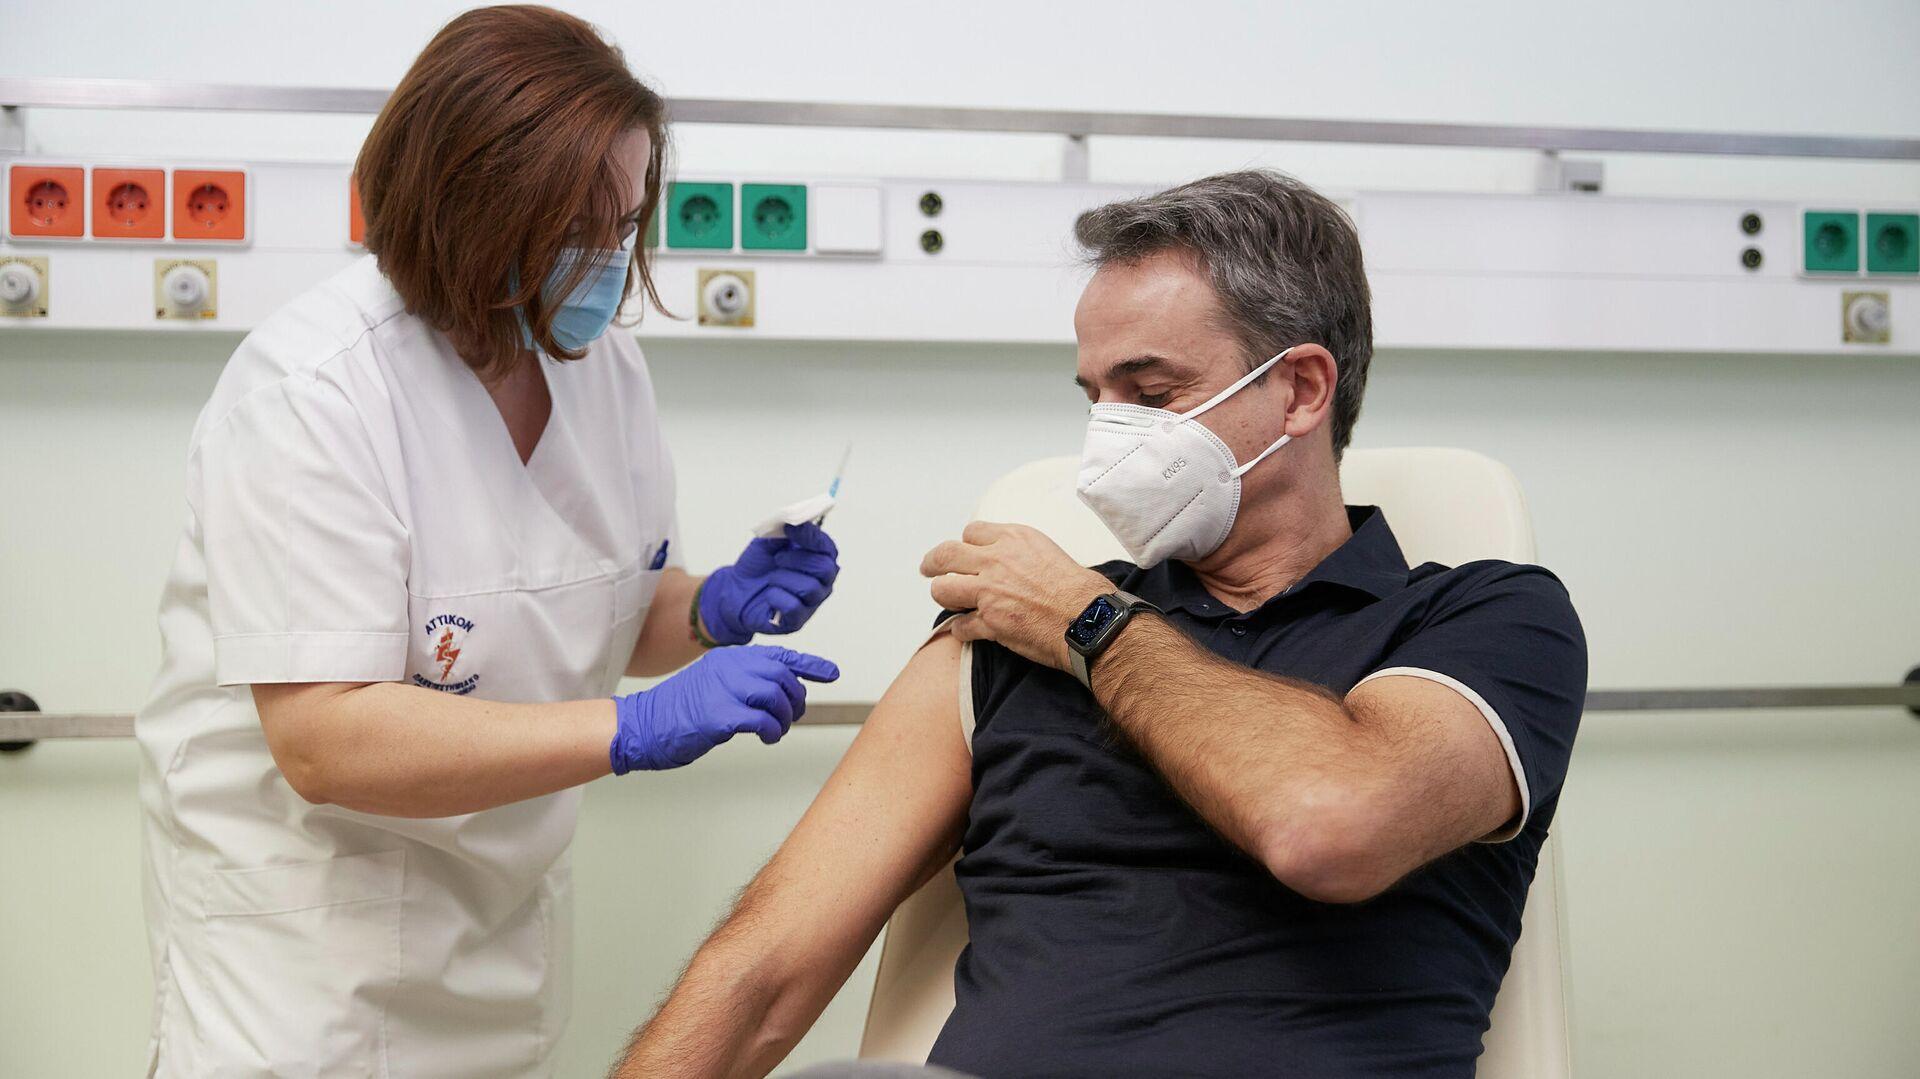 Премьер-министр Греции Кириакос Мицотакис во время вакцинации от коронавируса - РИА Новости, 1920, 20.01.2021